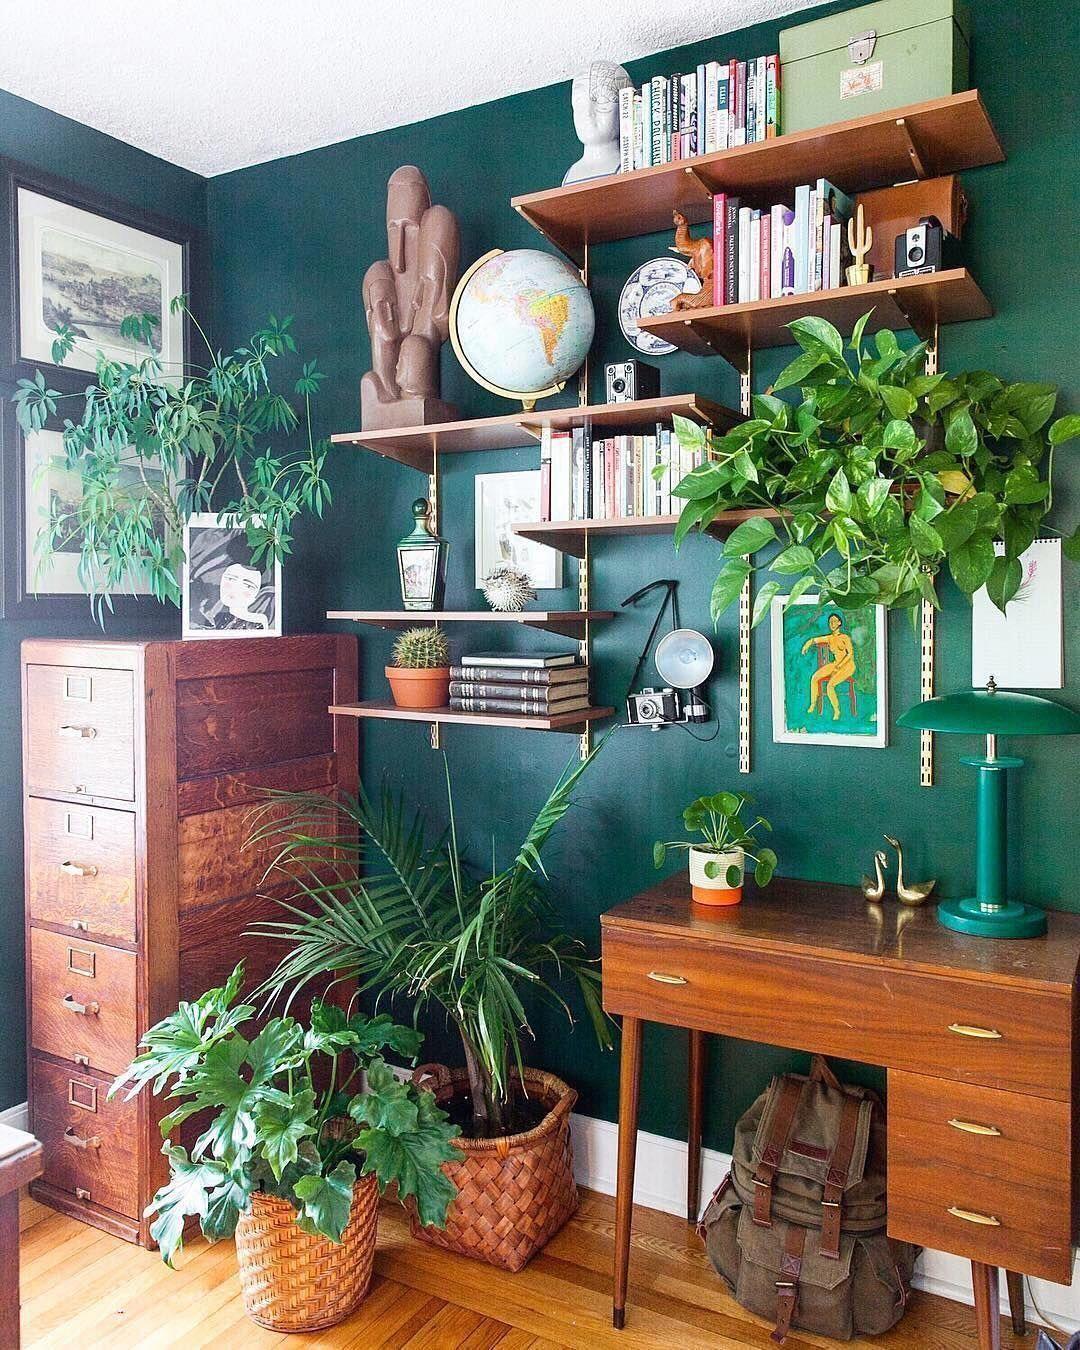 Apartment Therapy On Instagram One Wild Office Shelfie Image Imjessicabrigham Homedecorretro Small Room Design Living Room Green Apartment Interior